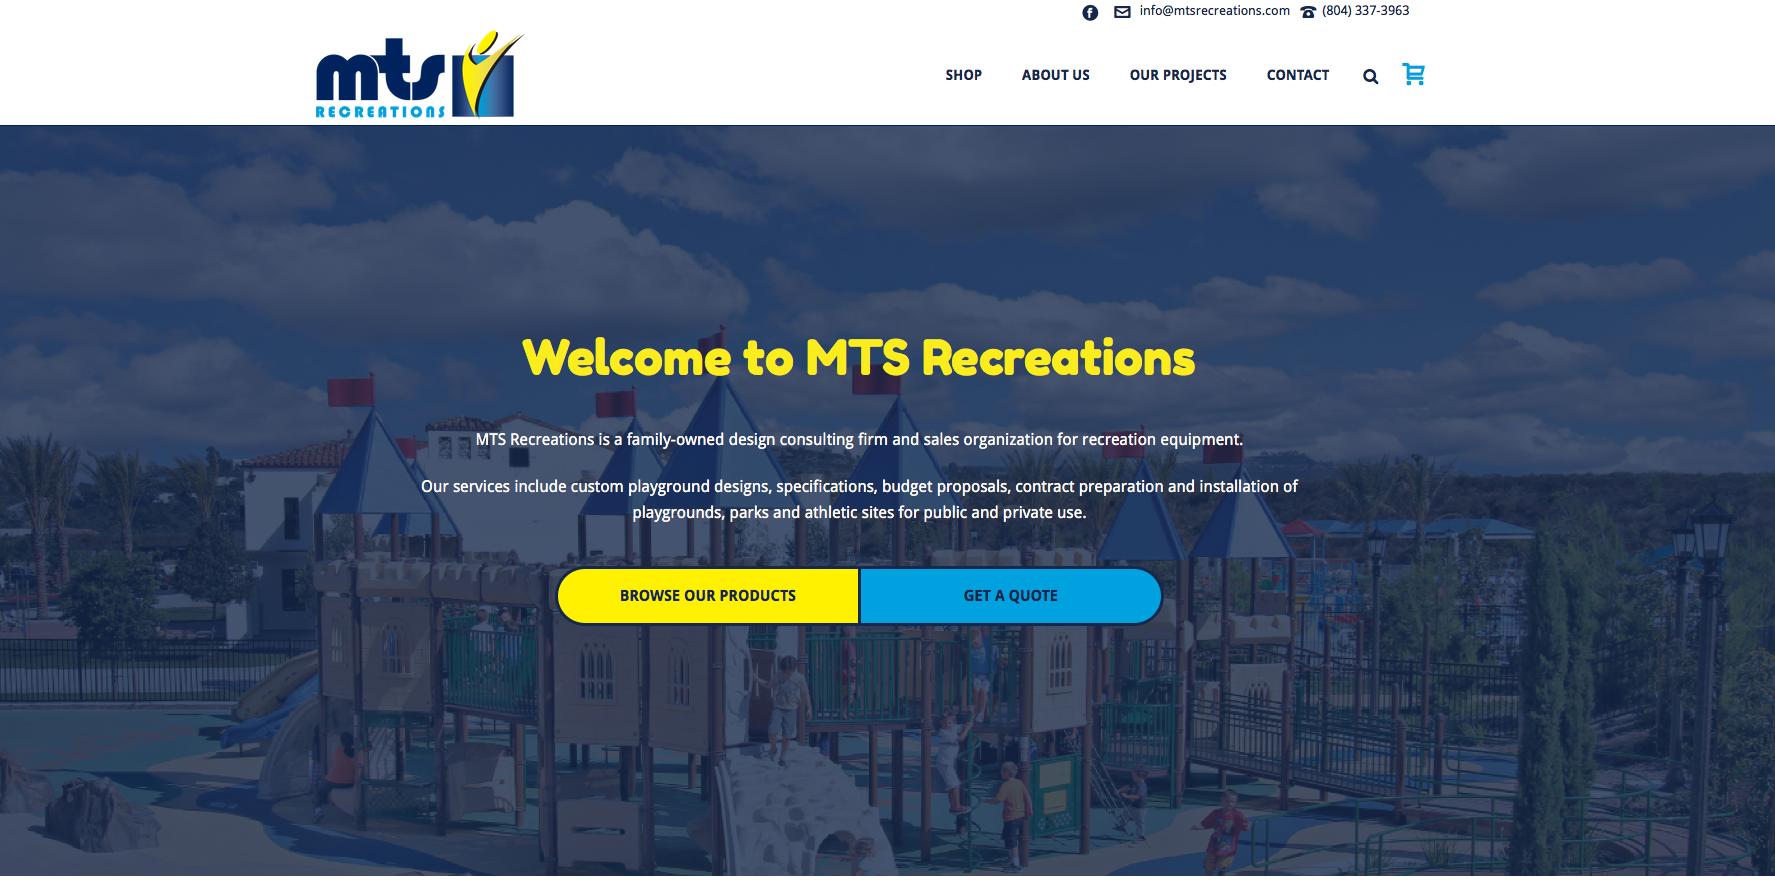 Jupiter Theme Examples | Creative Agency Boulder Colorado | Website Design | MTS Recreations